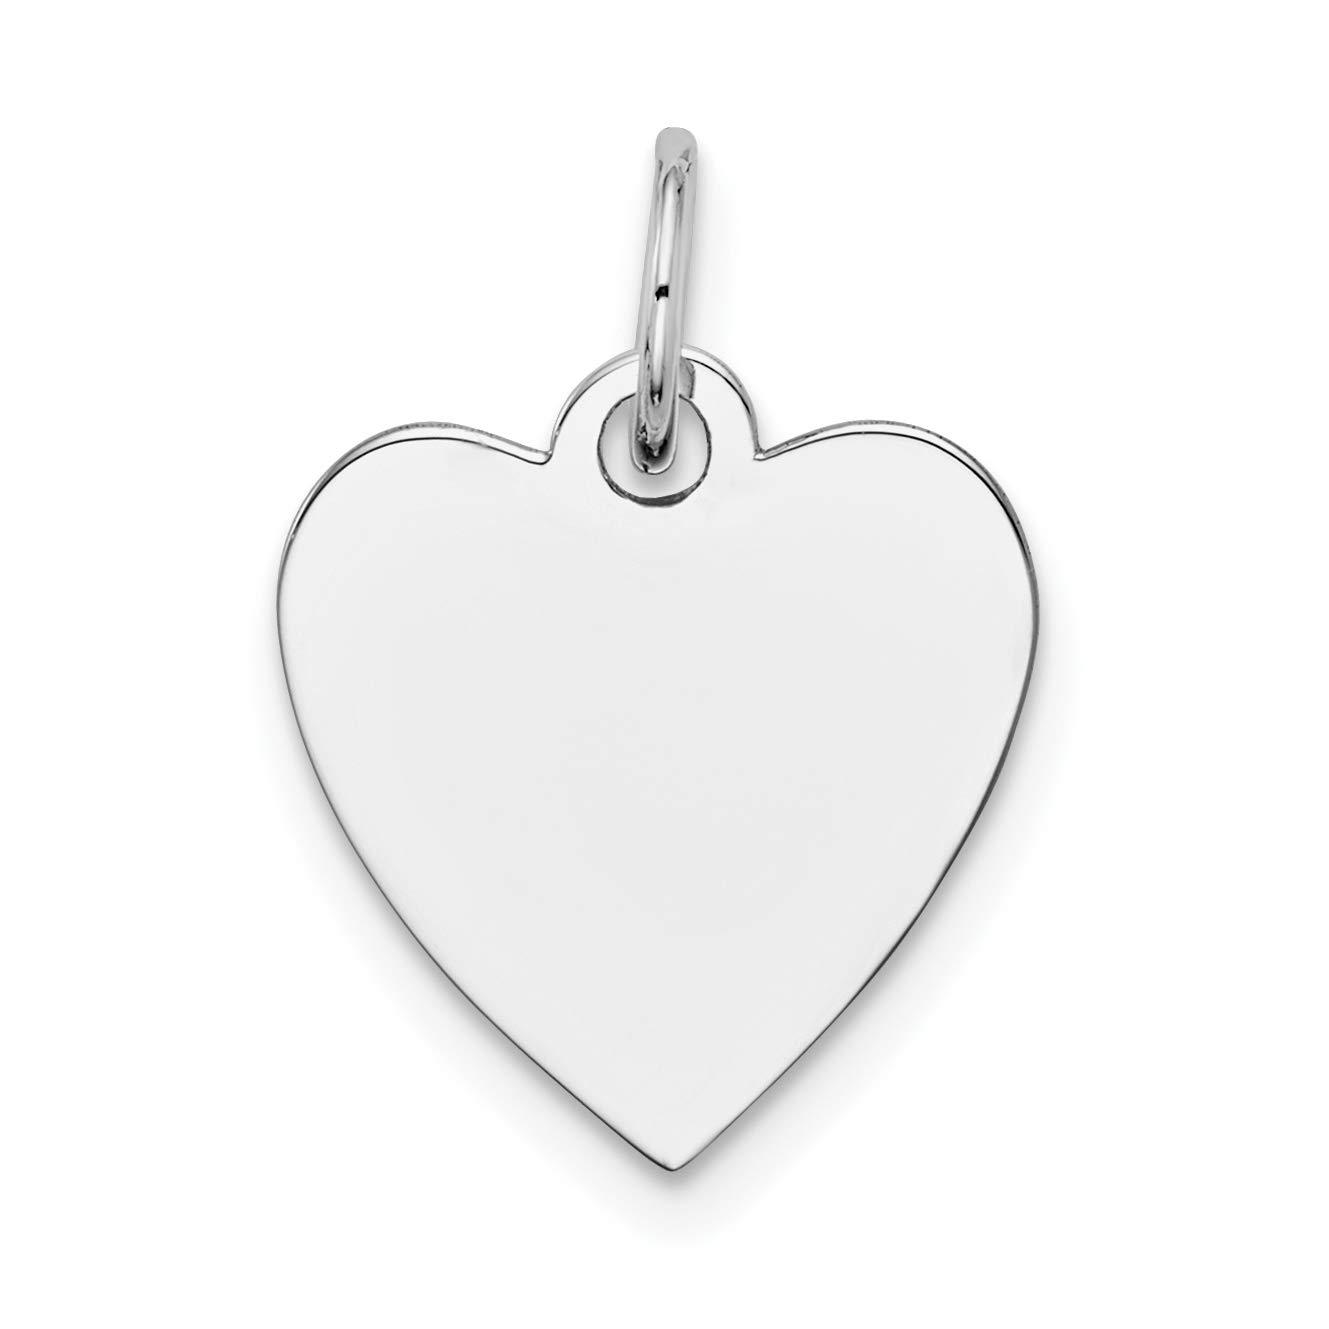 14k White Gold Plain .011 Gauge Engravable Heart Charm